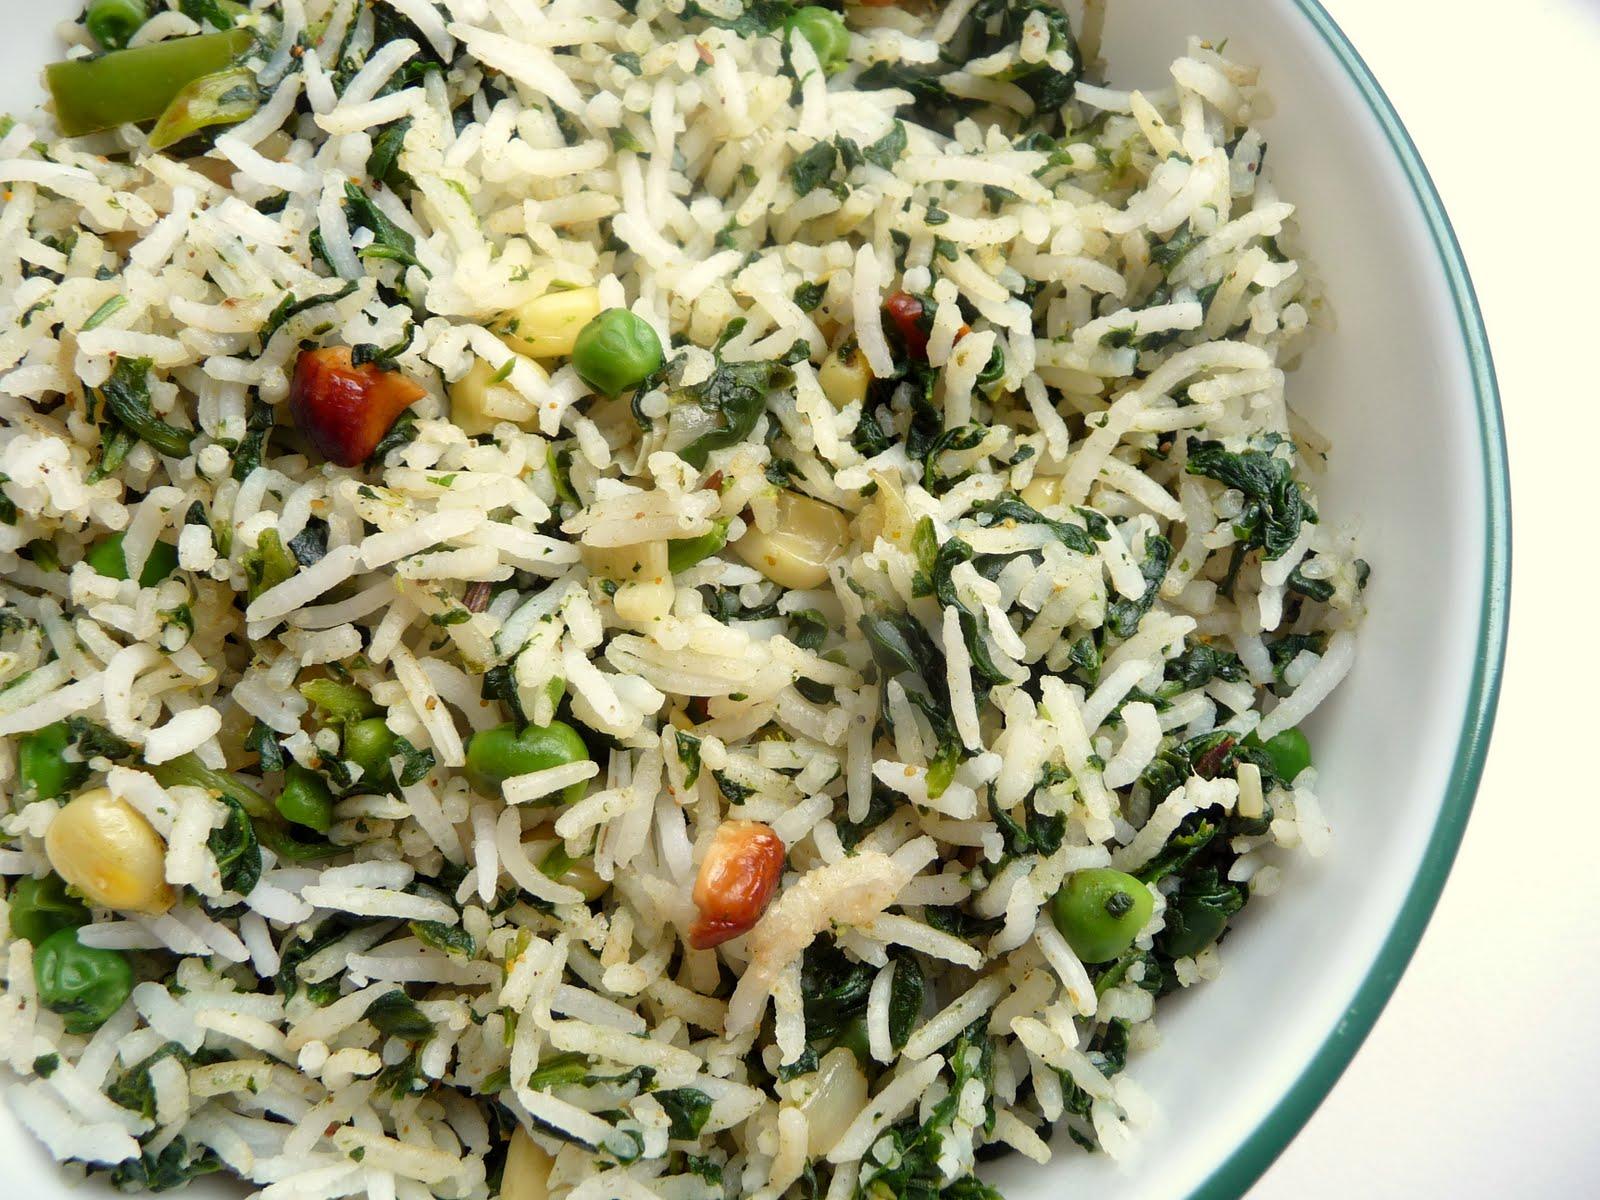 Uncooked Basmati Rice - 2 cups